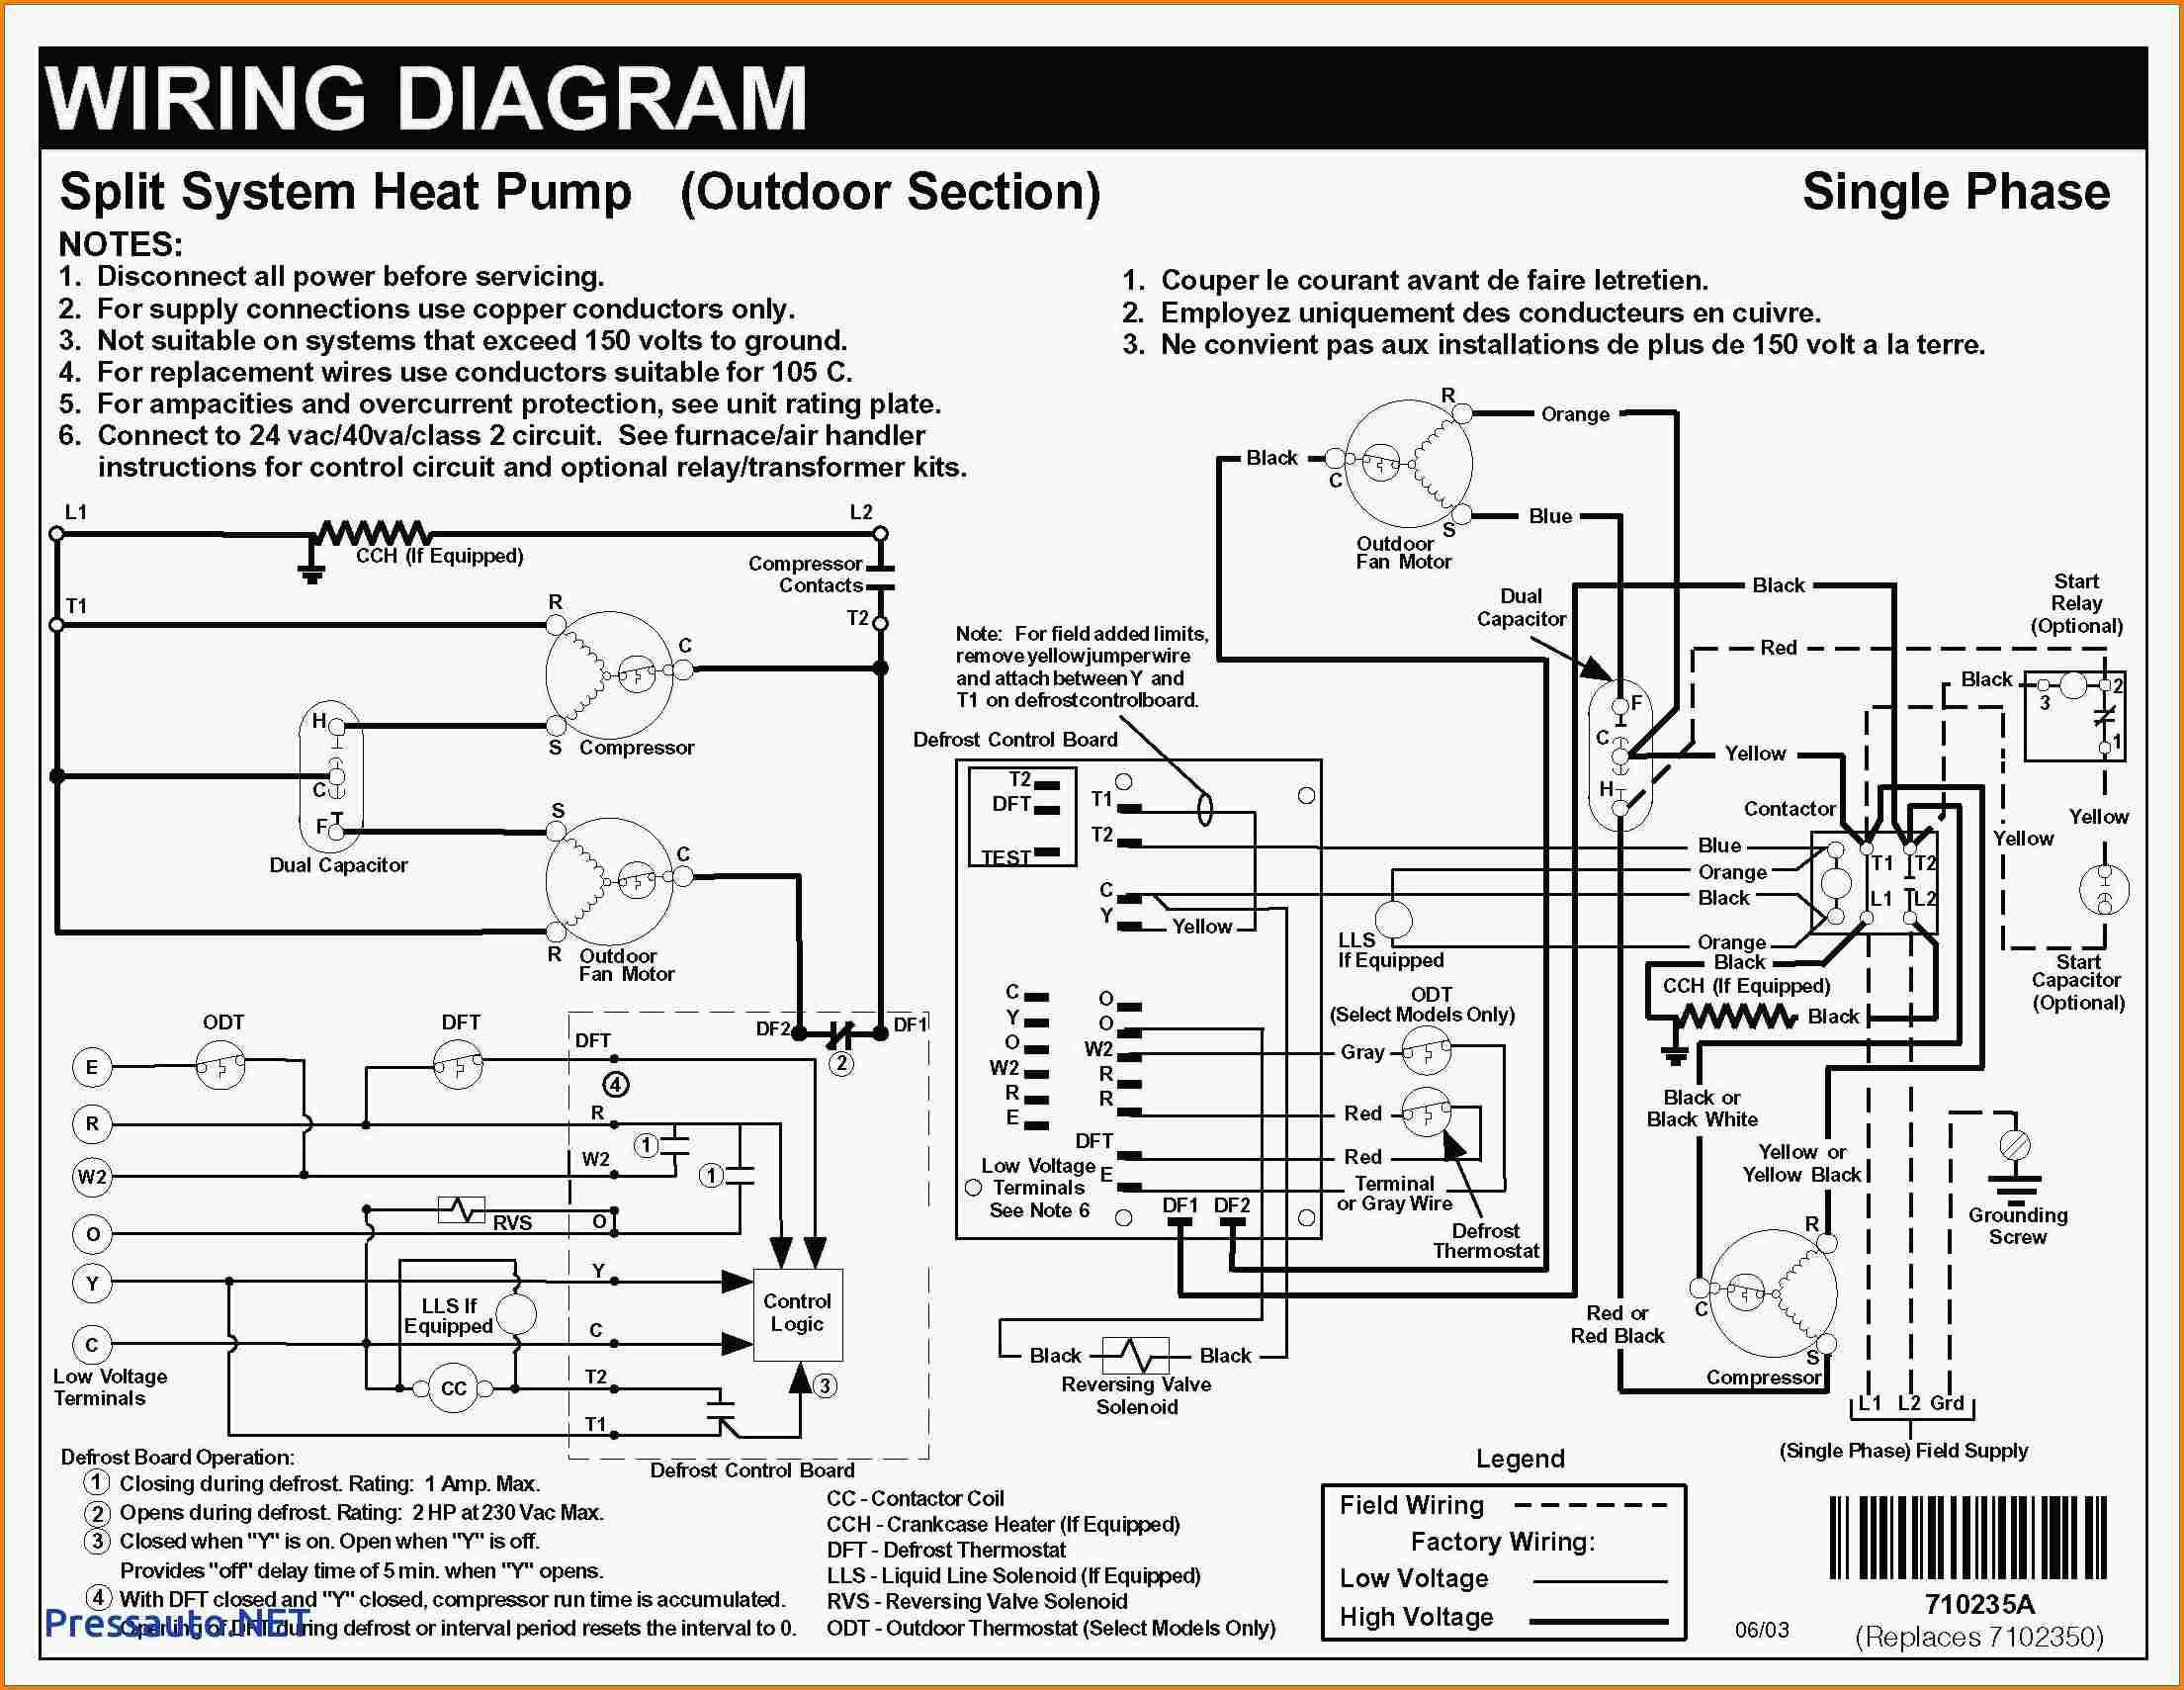 urgent lennox g61mpv furnace schematic doityourselfcom communityold thermostat wiring diagram free download wiring diagram schematic urgent lennox g61mpv furnace schematic doityourselfcom community